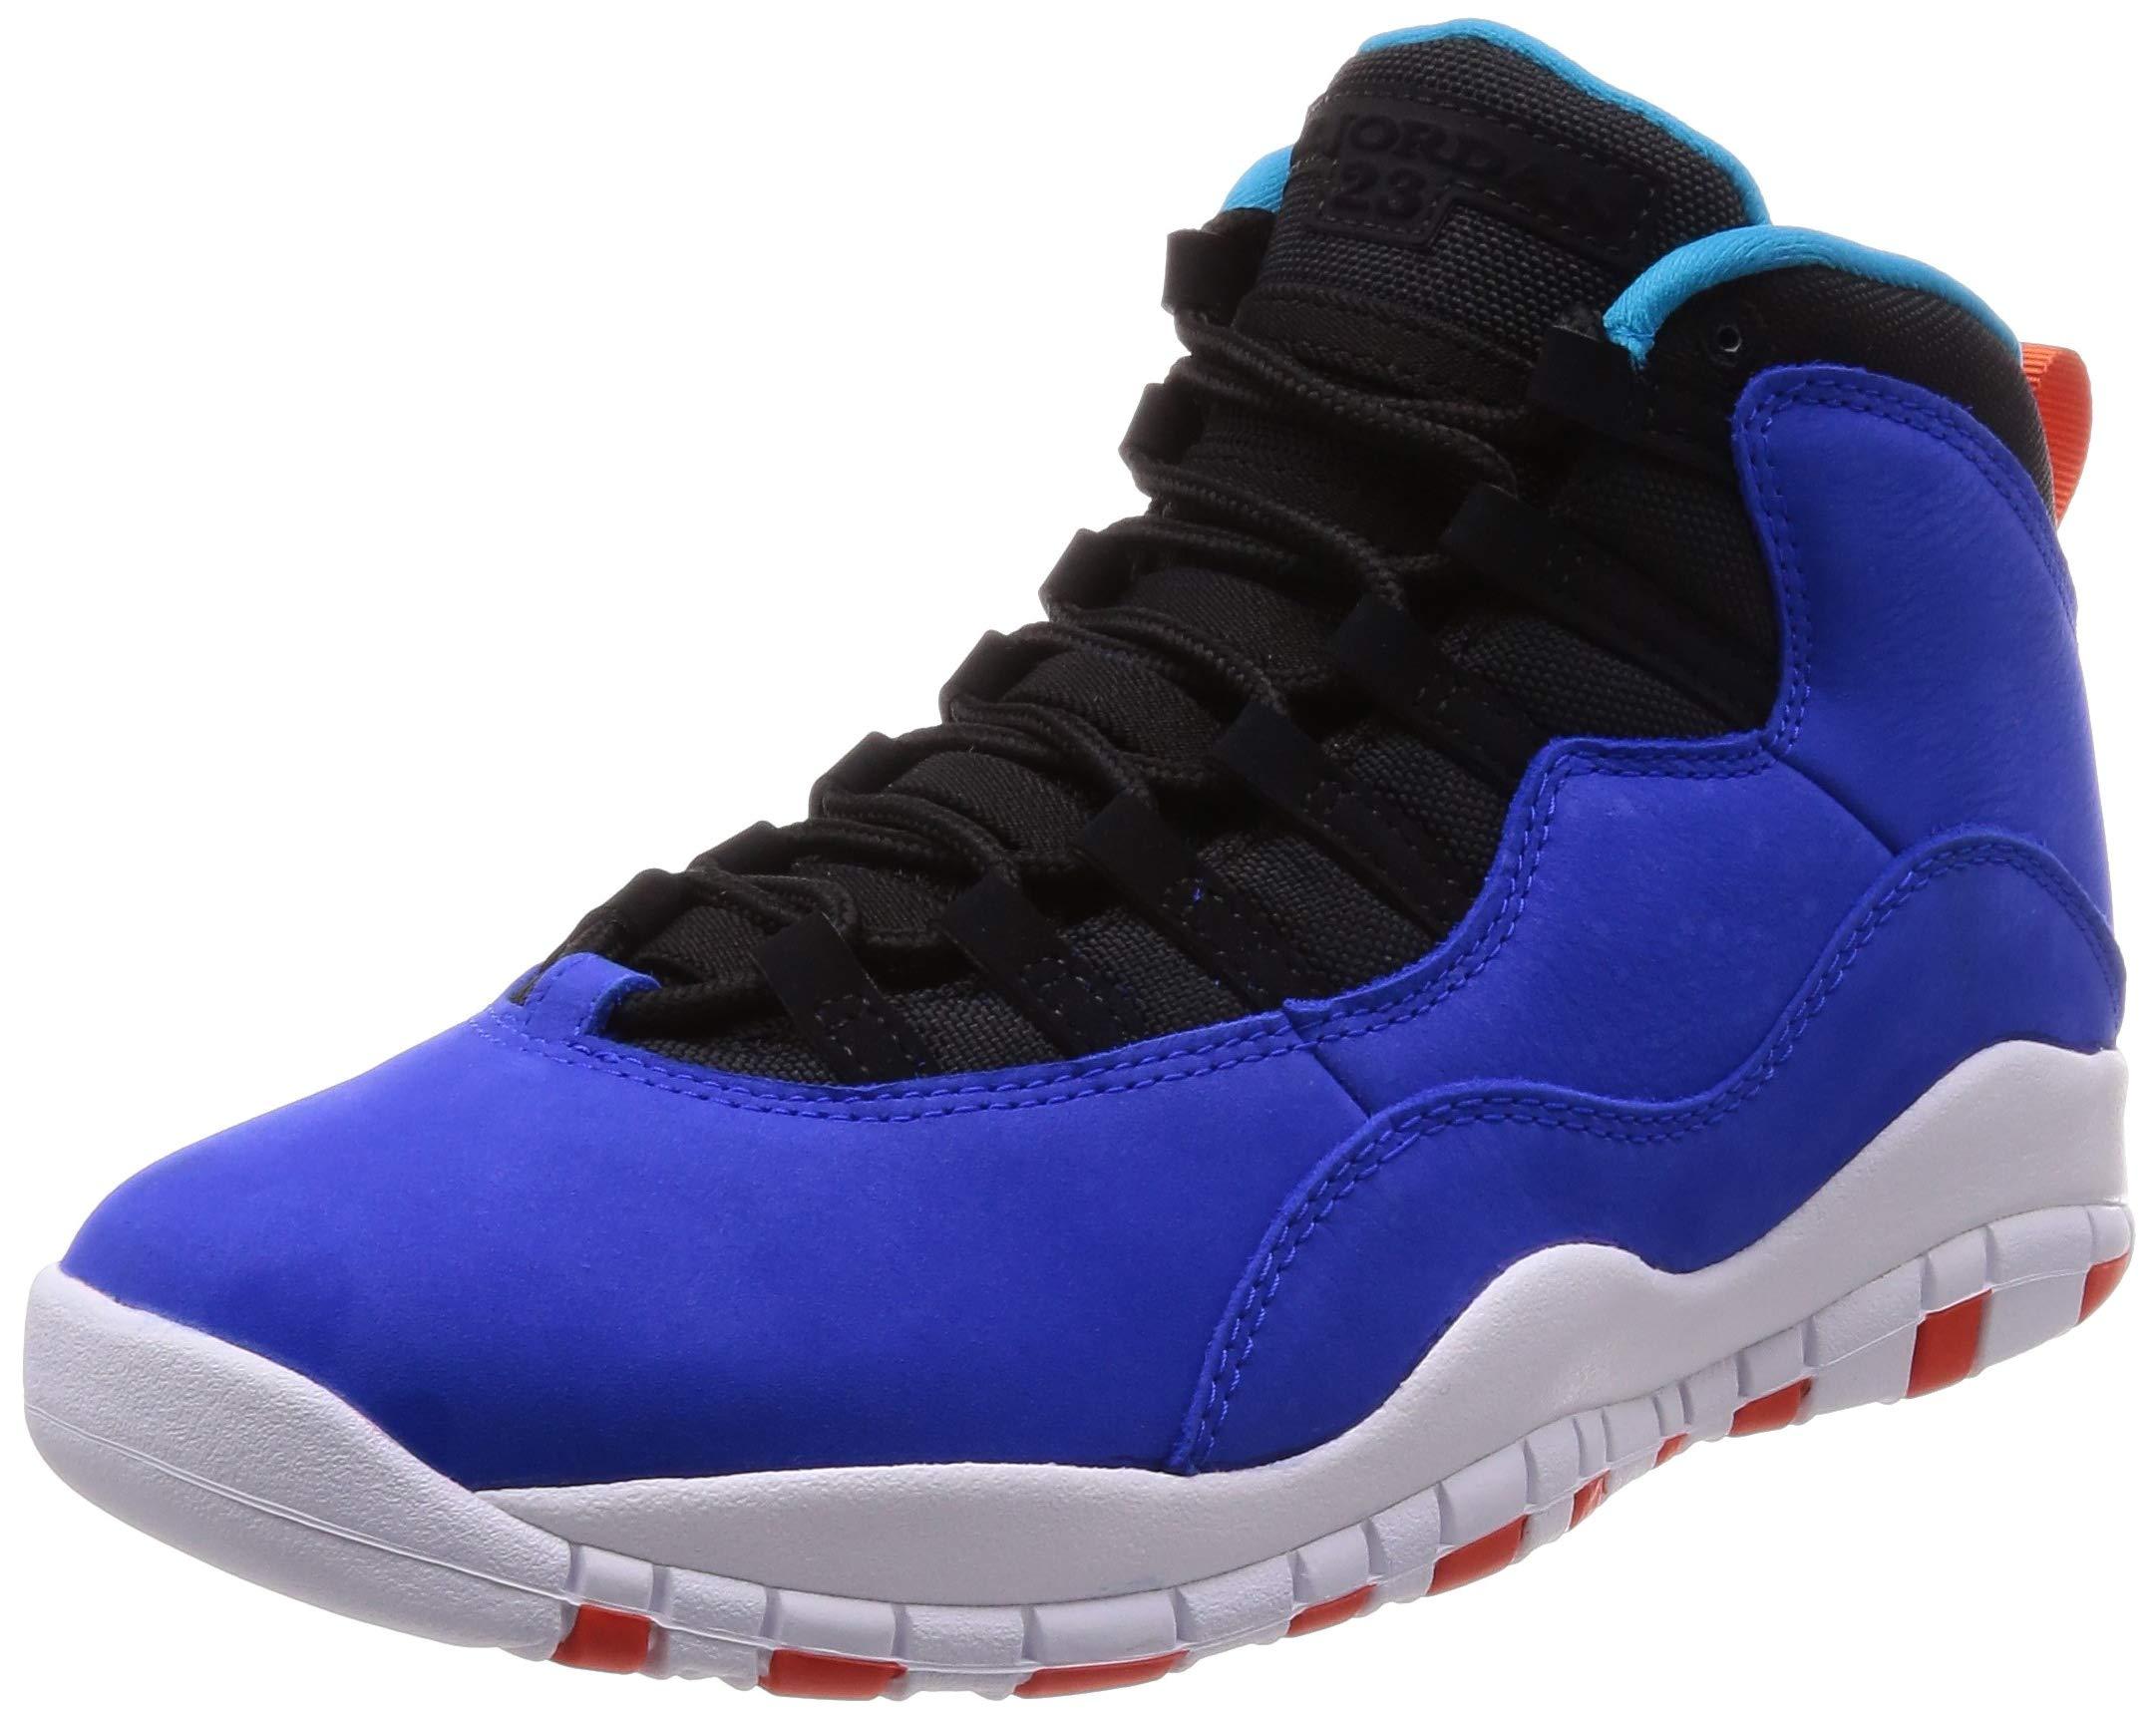 Air Jordan 10 Retro Mens Shoes Racer Blue/Team Orange/Black 310805-408 (10.5 M US) by Nike